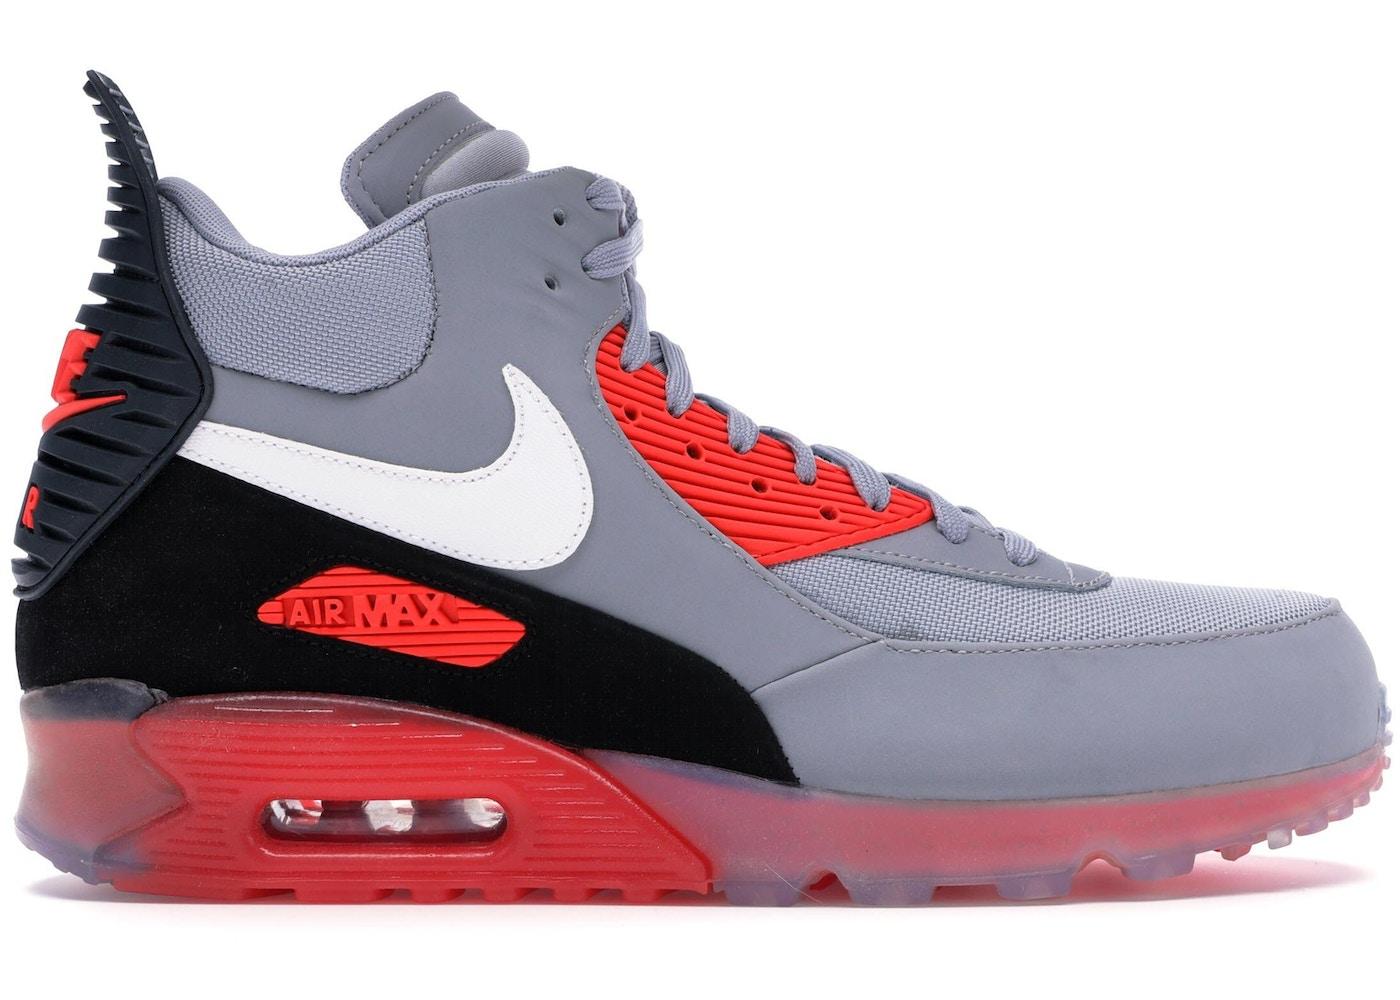 Lavandería a monedas Profesor Molde  Nike Air Max 90 Sneakerboot Ice Wolf Grey Infrared - 684722-006